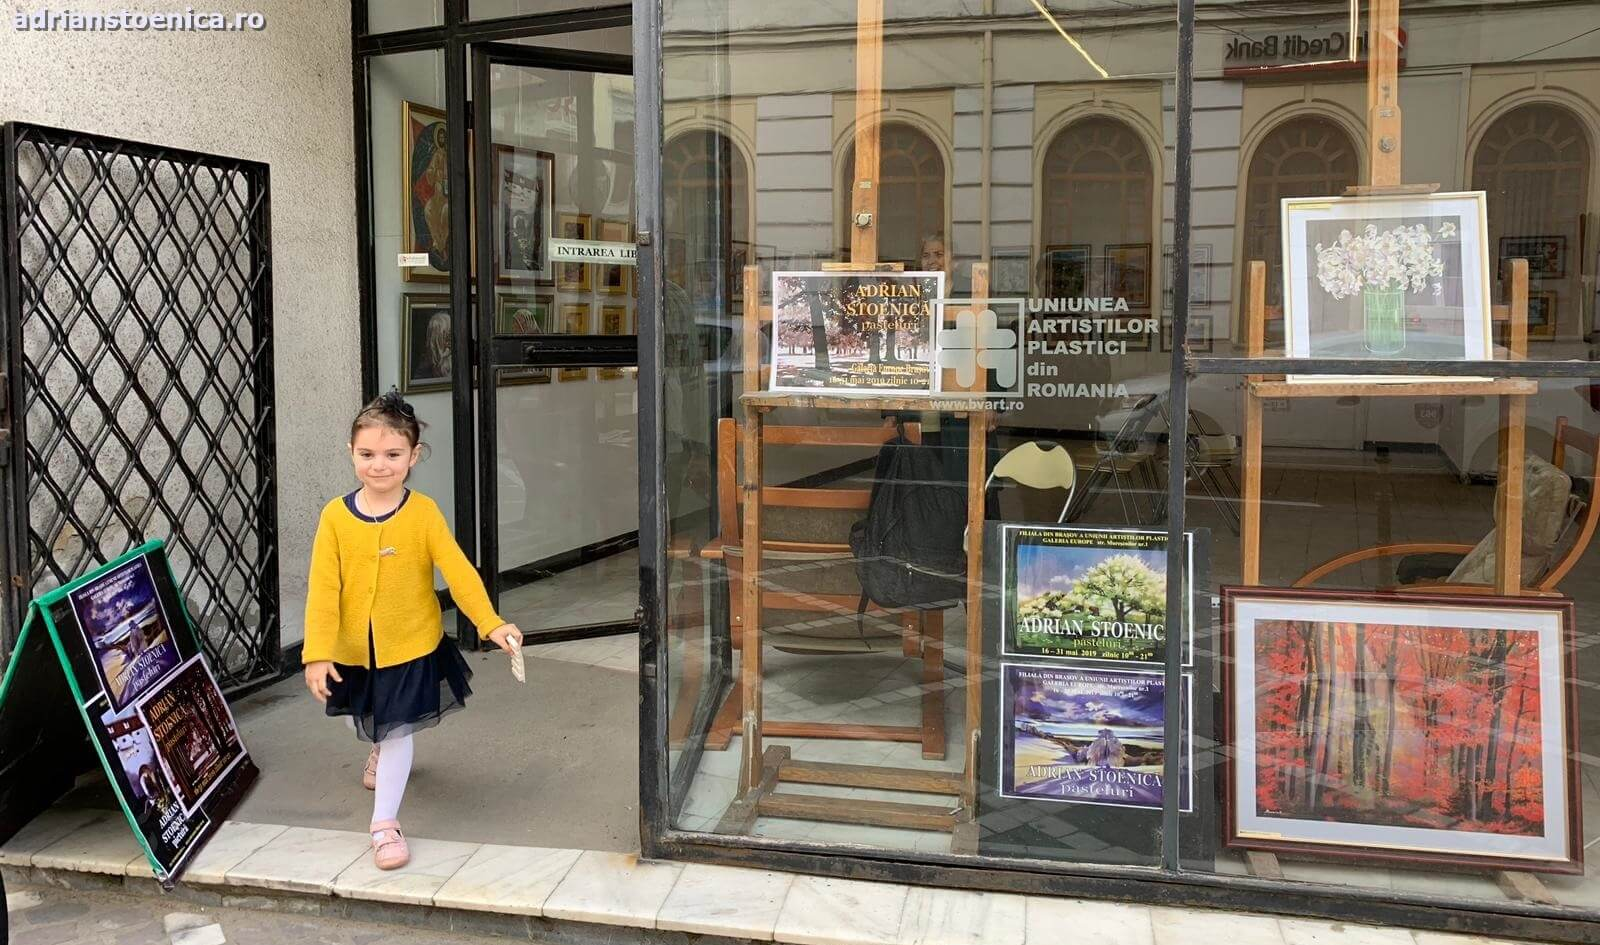 expozitie-de-pictura-brasov-tablouri-pictate-manual-pictor-adrian-stoenica-2019